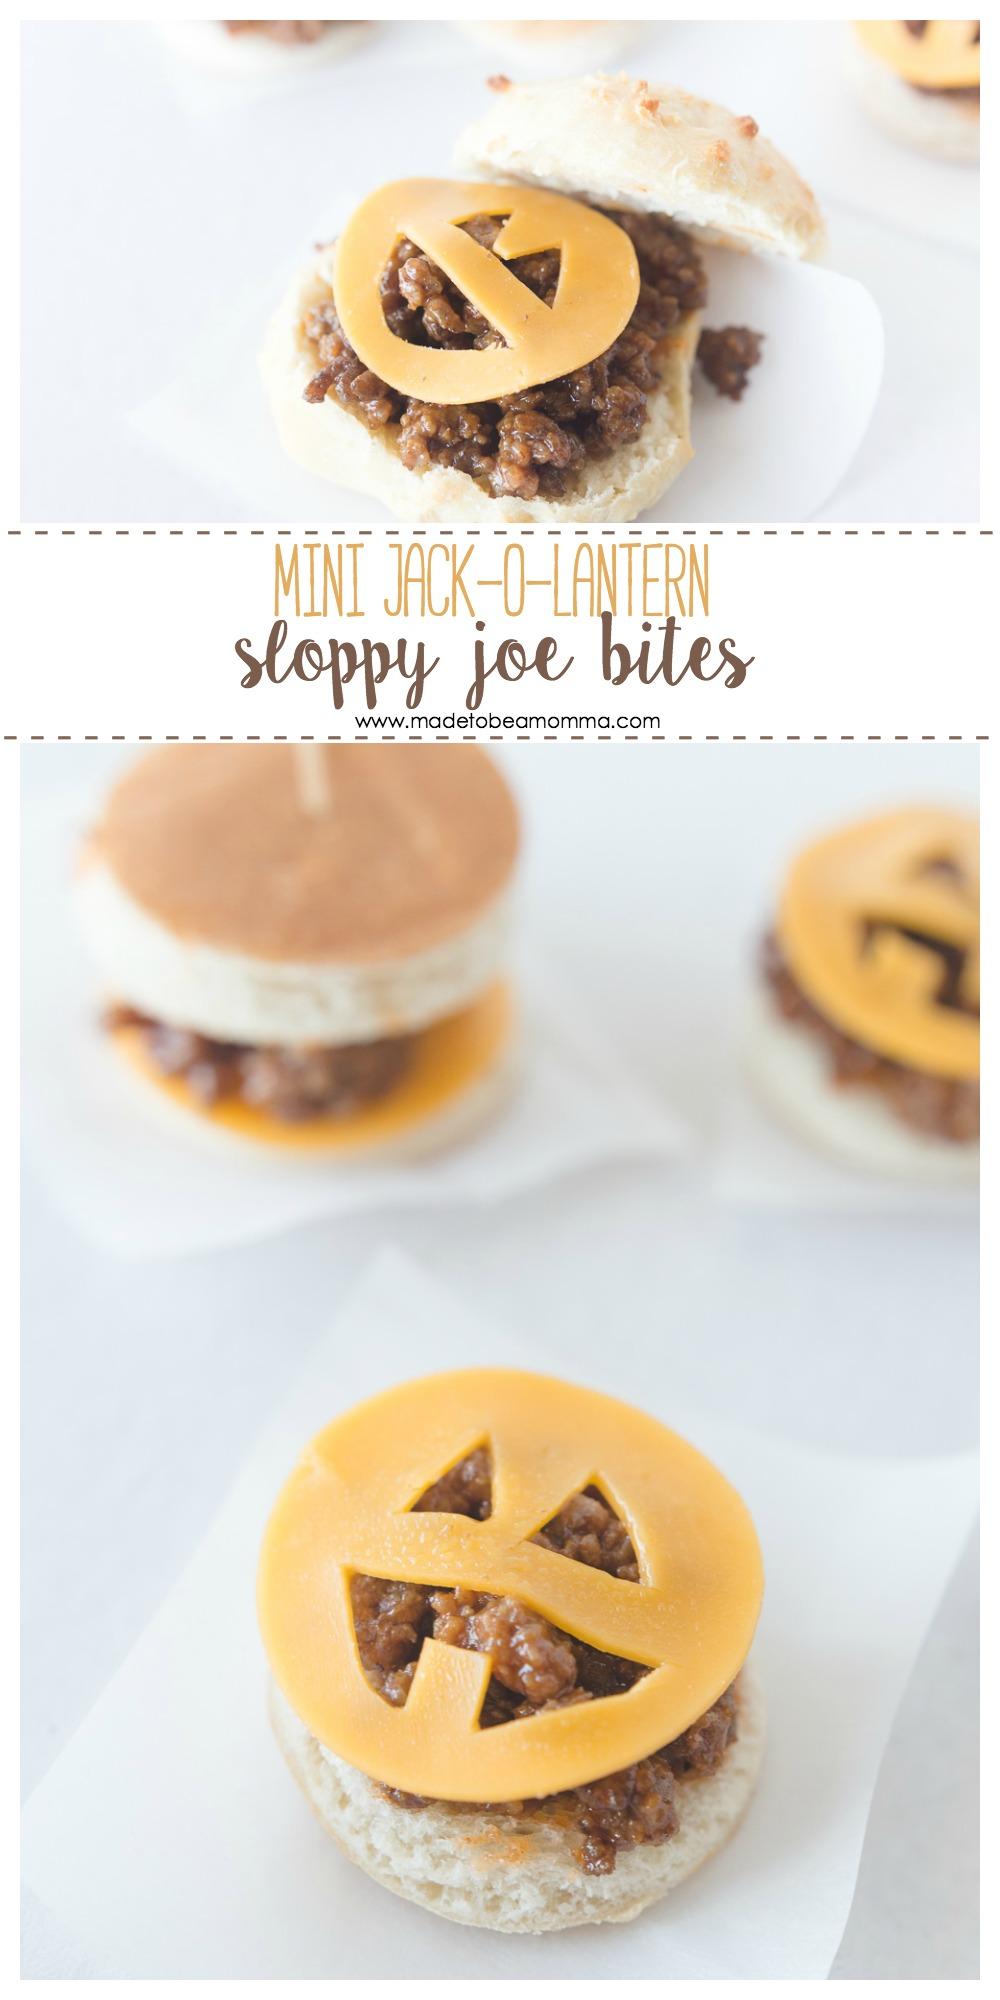 mini-jack-o-lantern-sloppy-joe-bites-www-madetobeamomma-com